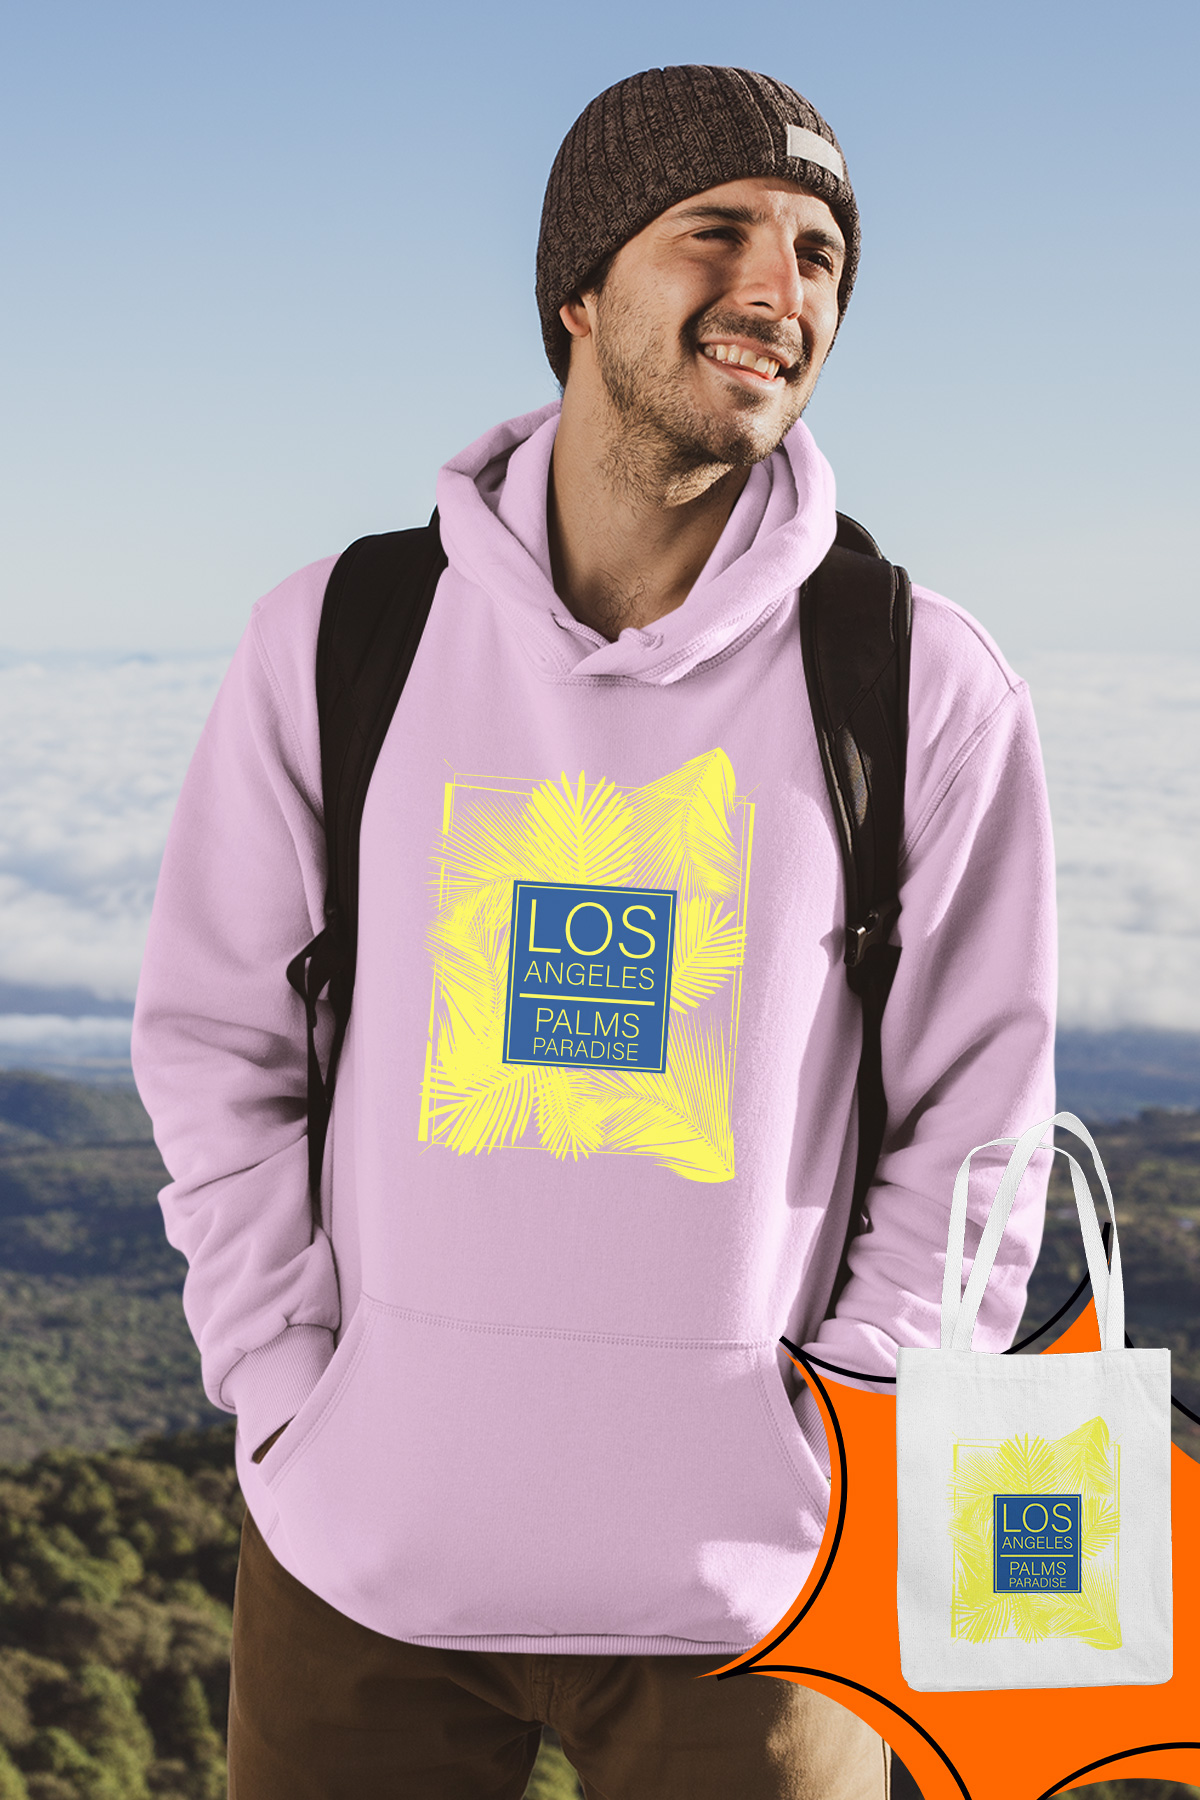 Angemiel Wear Los Angeles Palm Paradise Pink Male Hooded Sweatshirt Bags Kombin